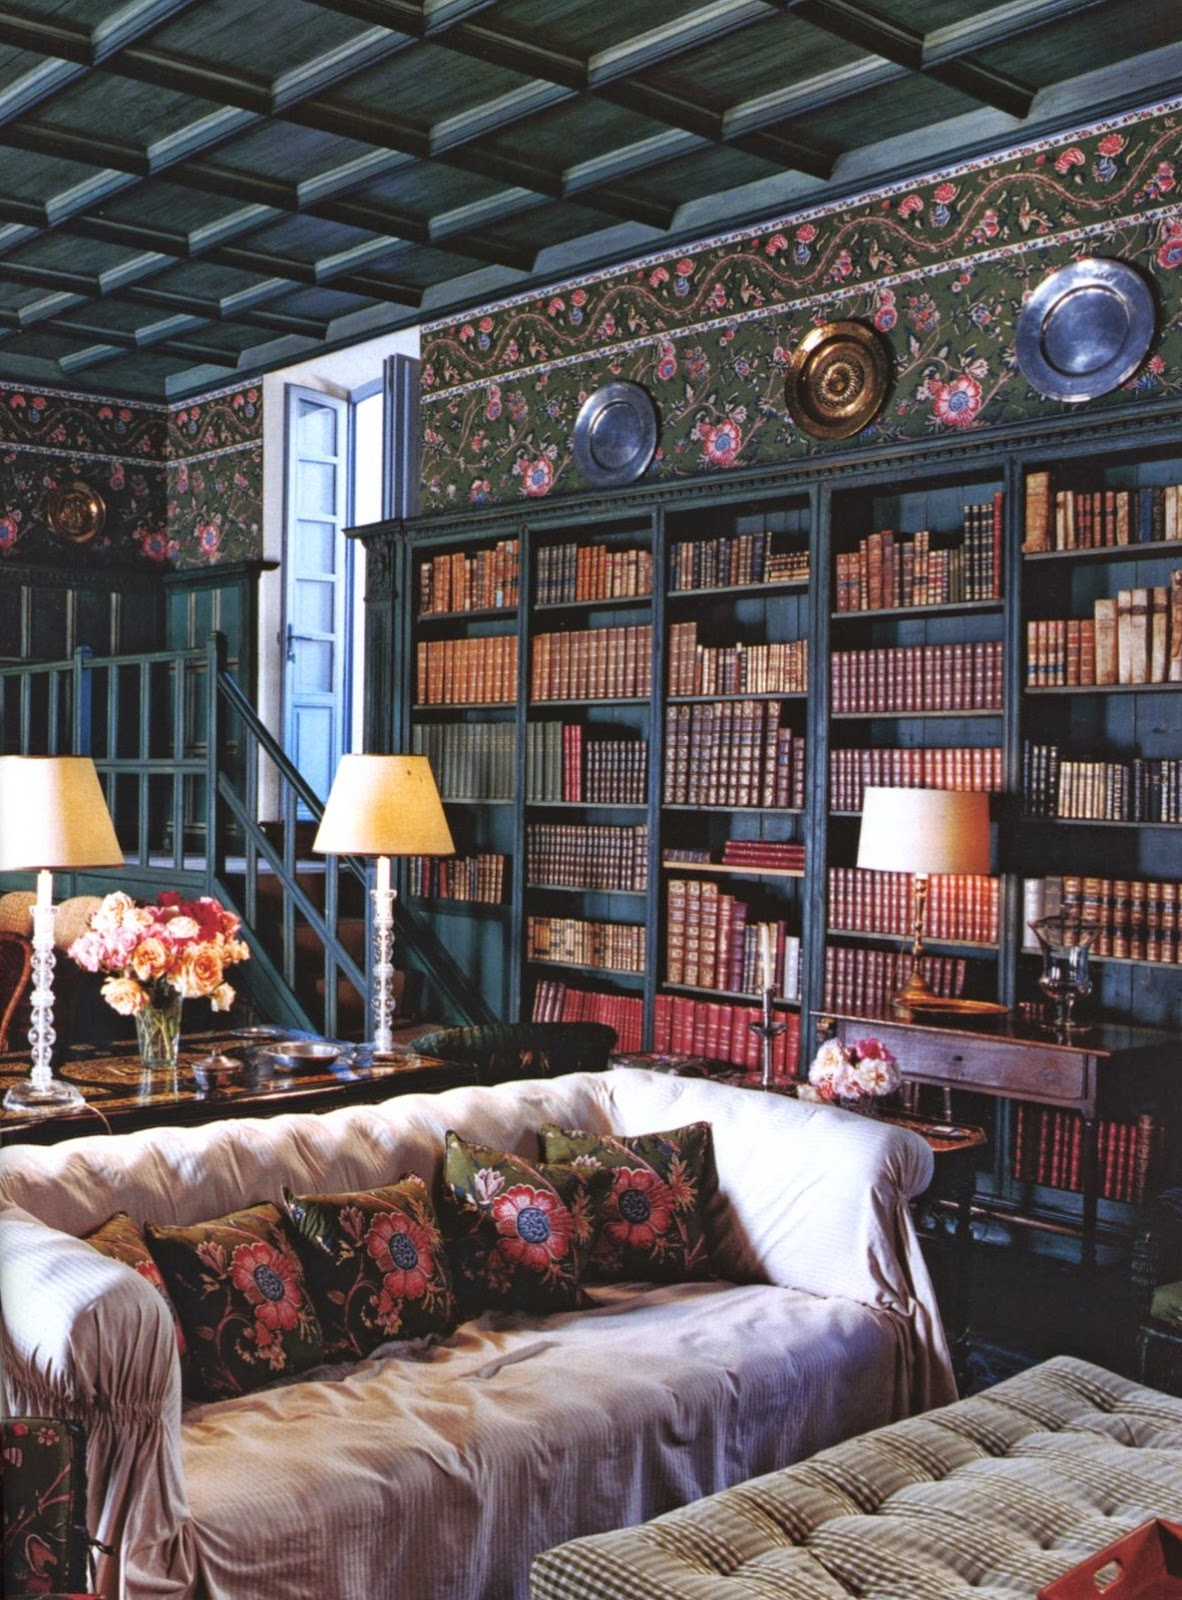 Old Study Room: Spencer Alley: Decorator Bookshelves